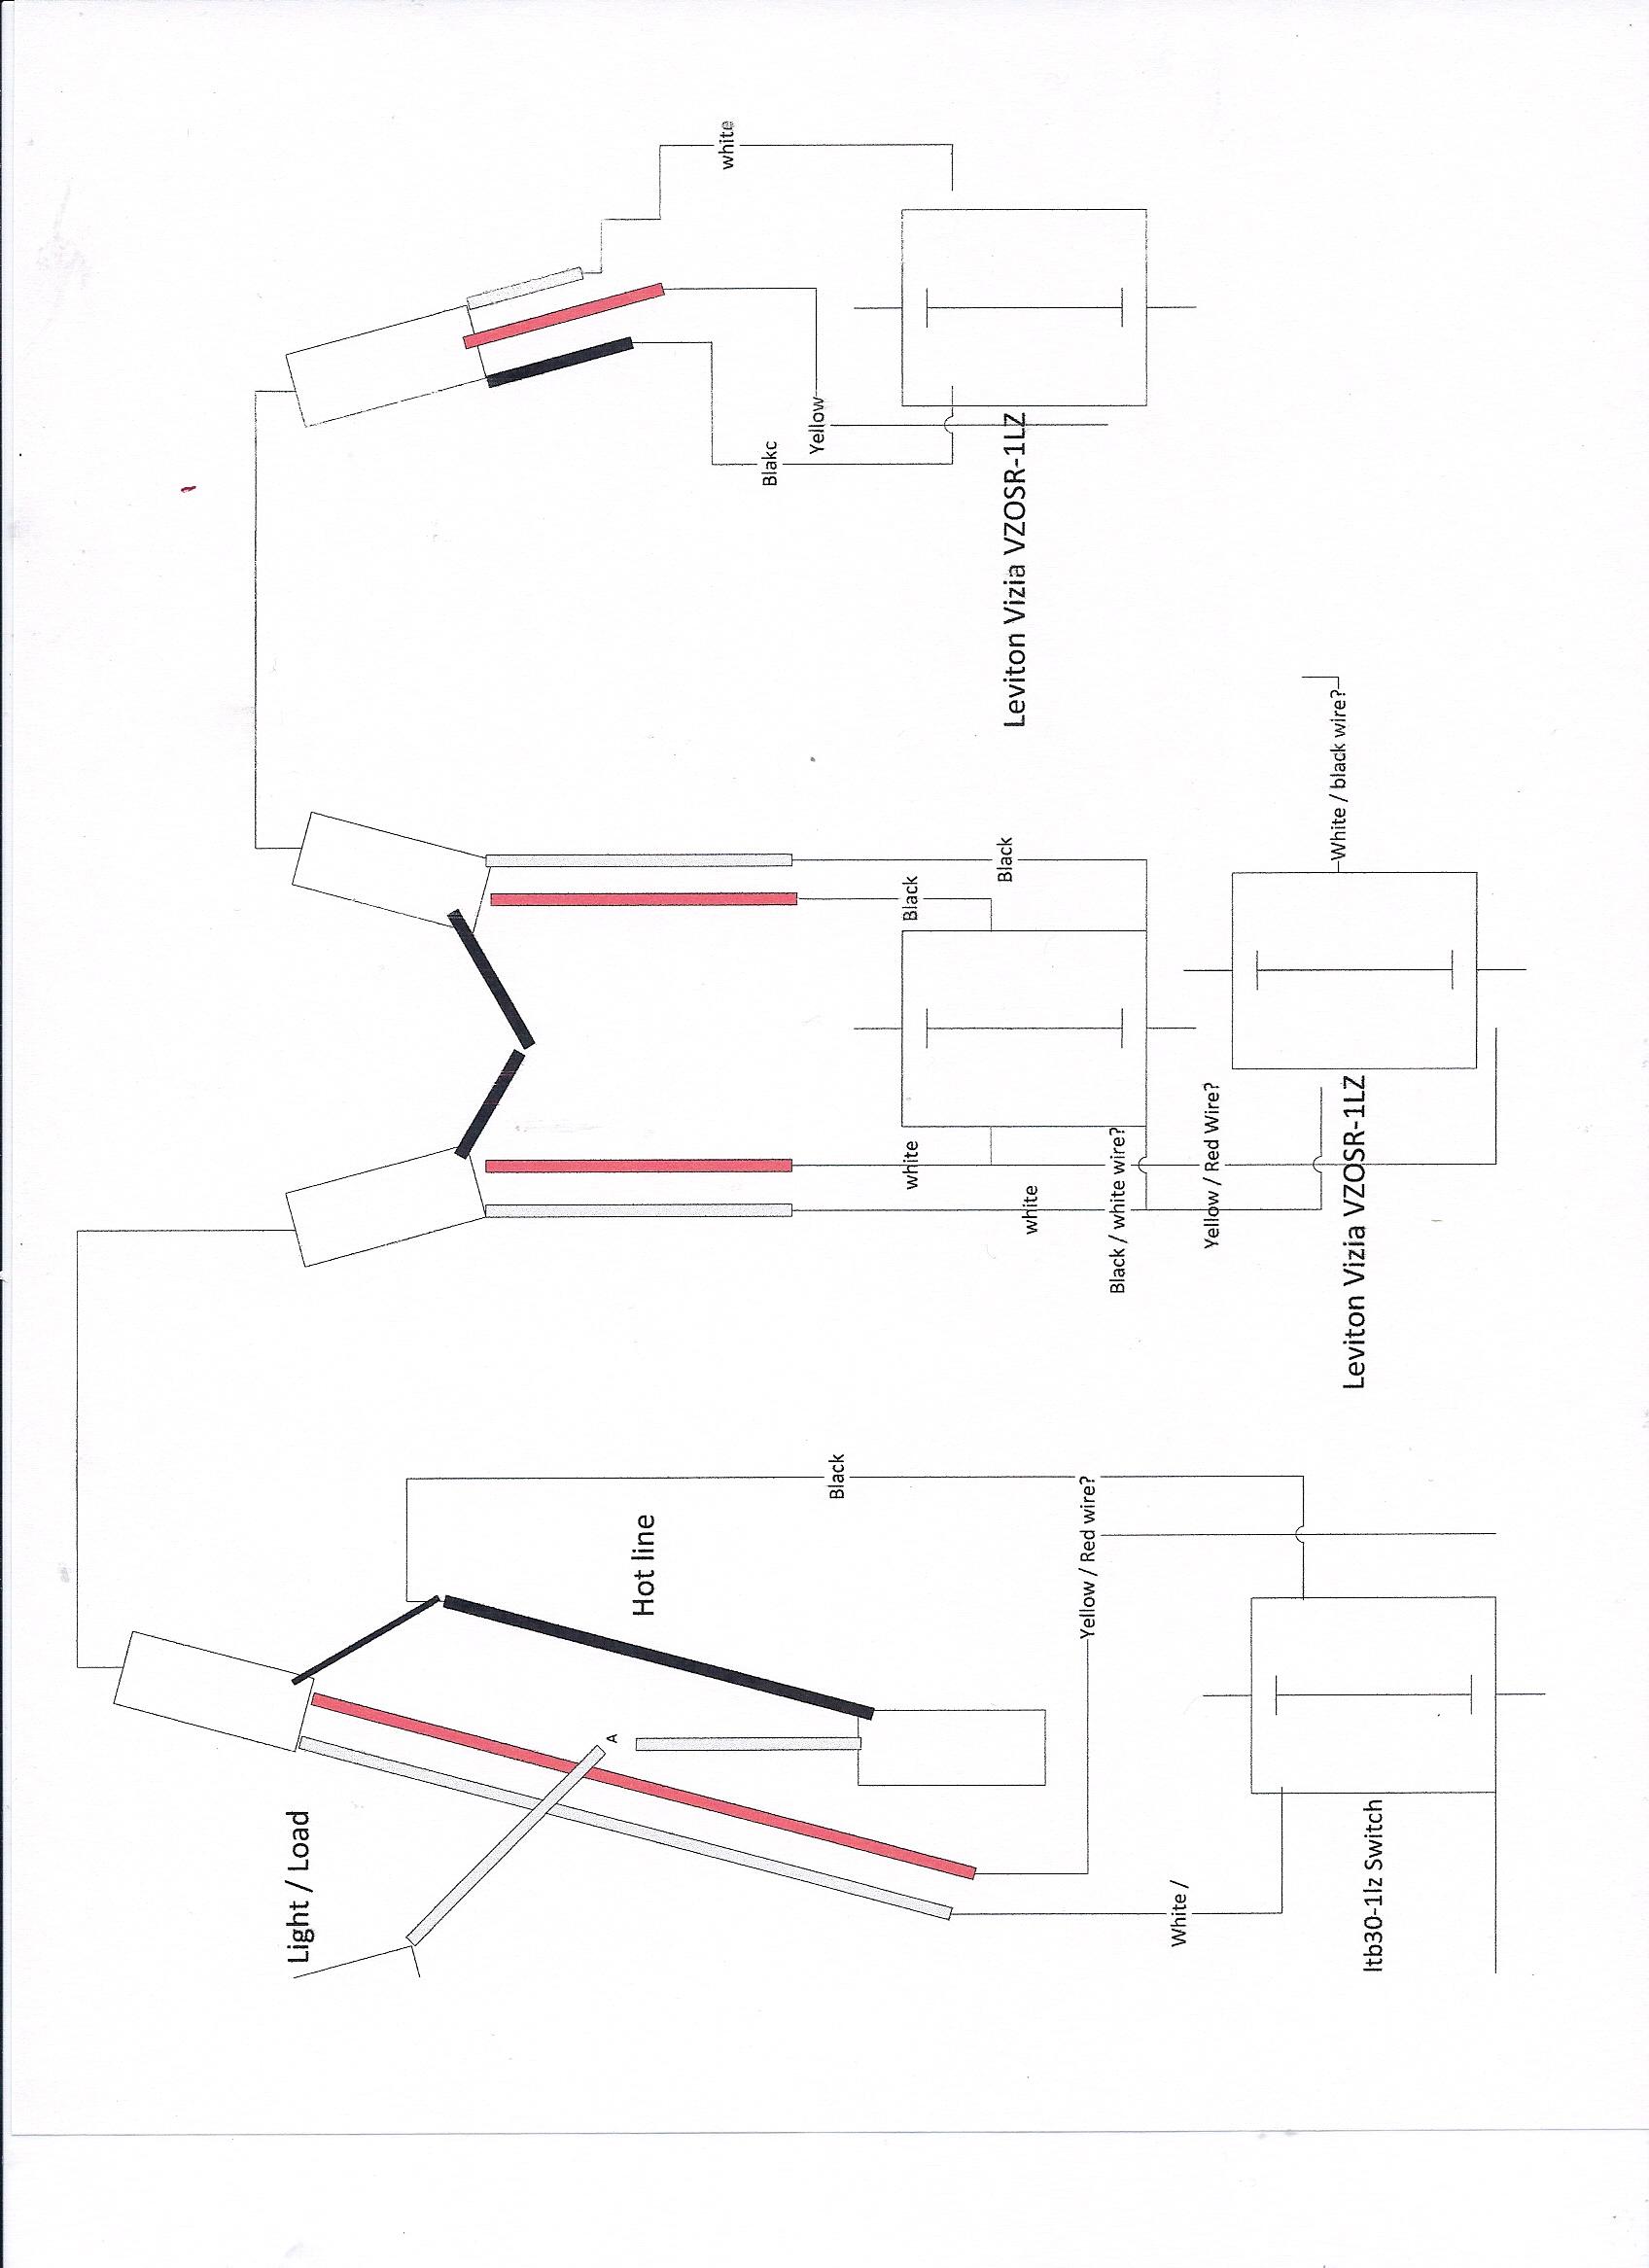 leviton ltb30 wiring diagram